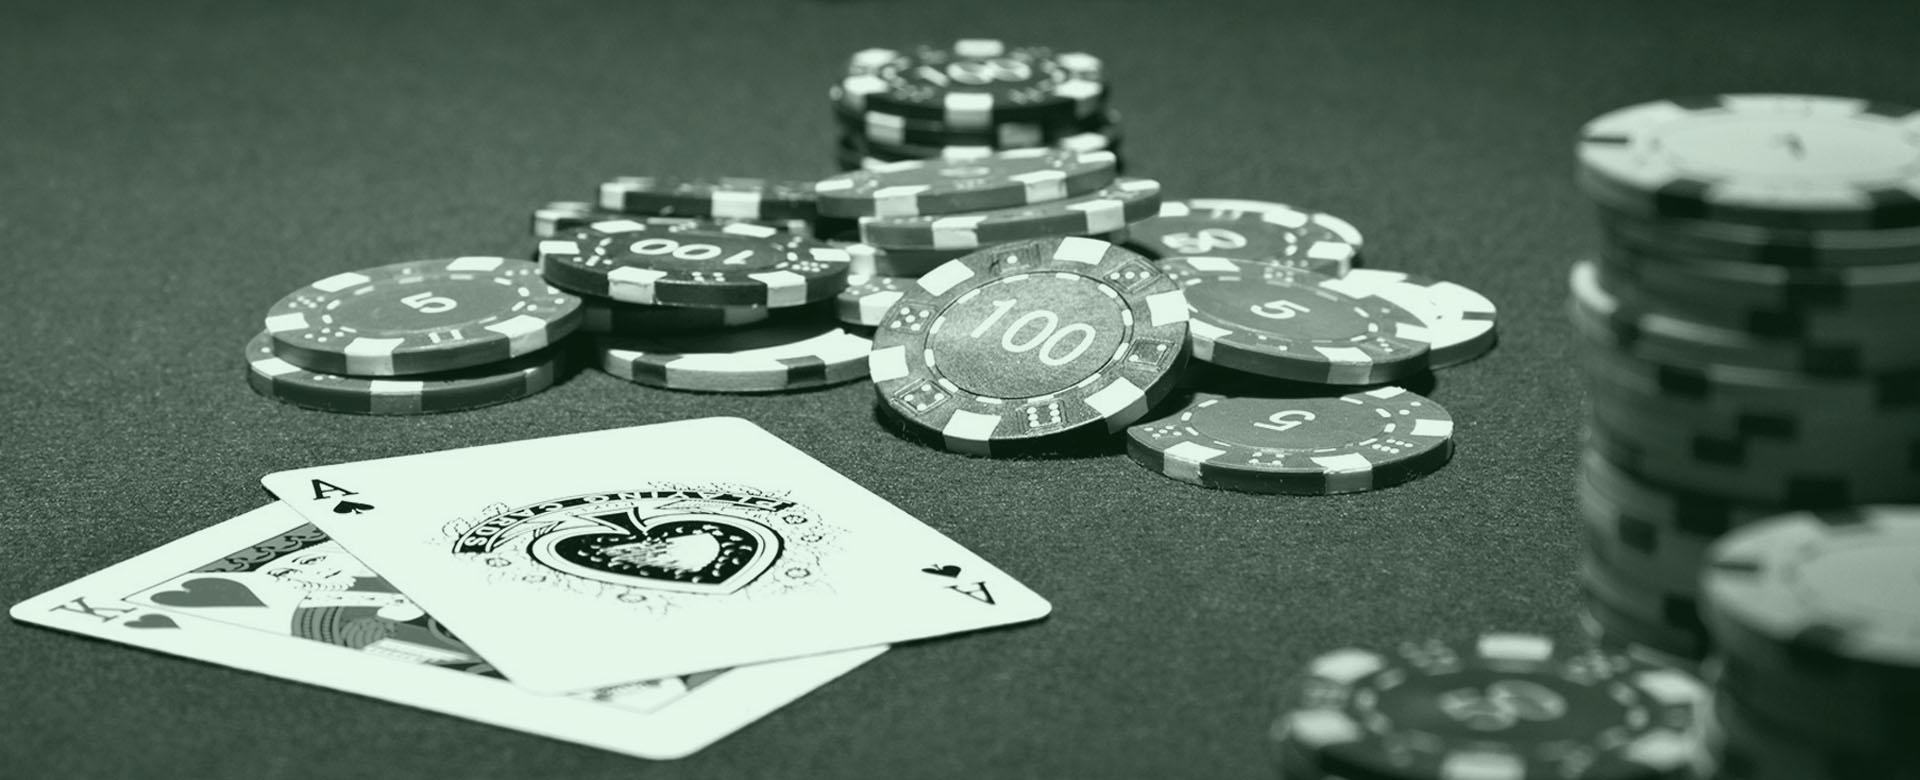 game poker terpercaya